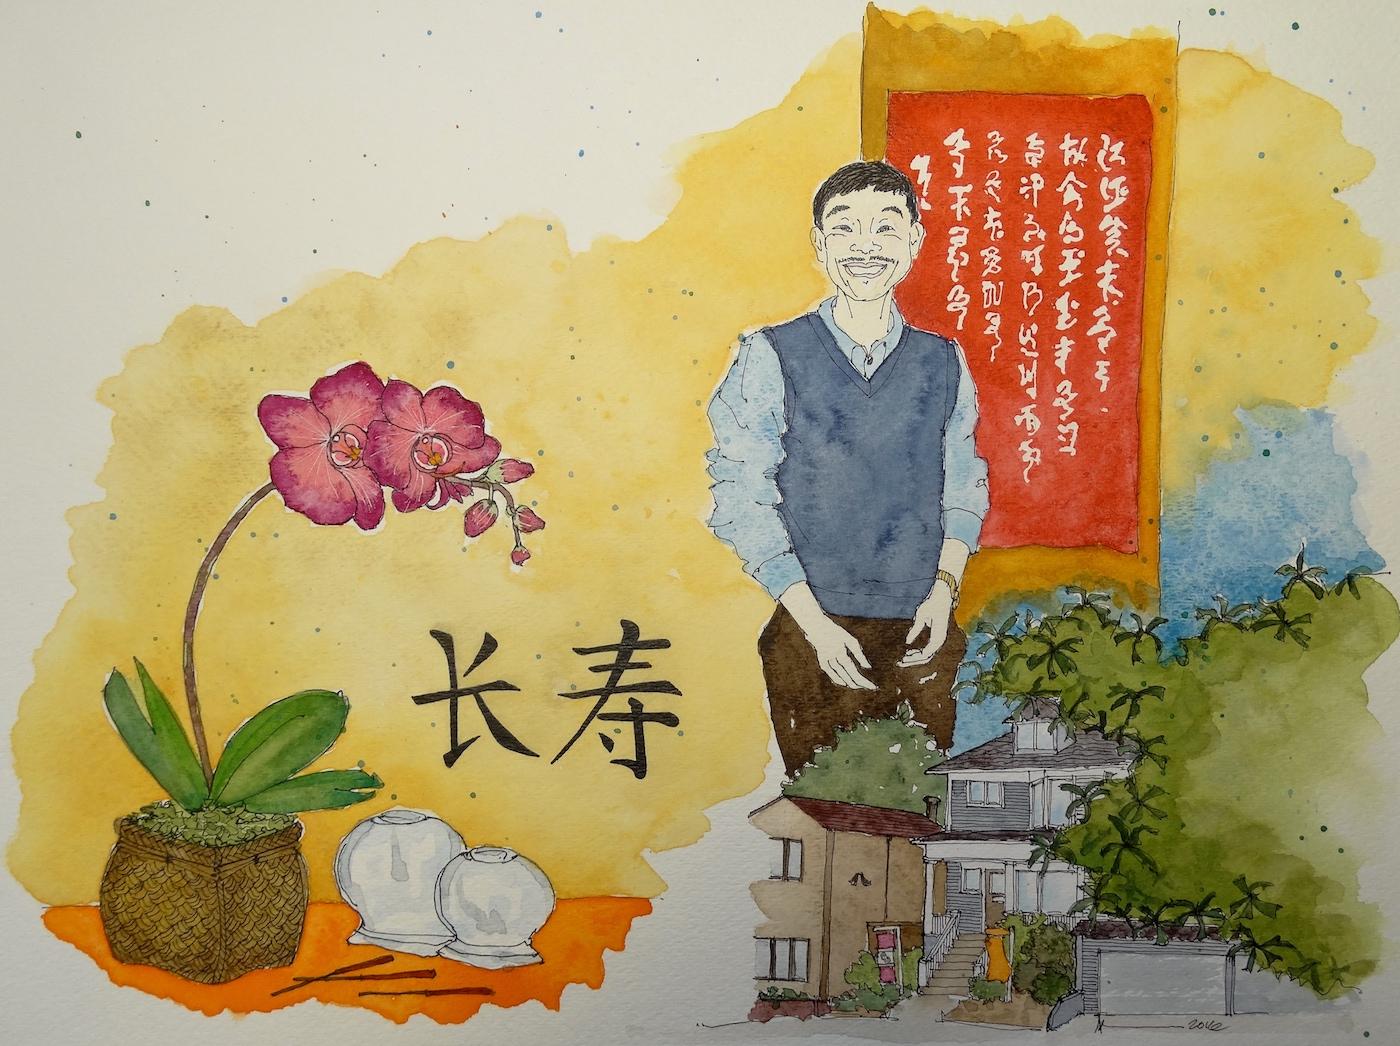 Dr. Qin, Golden Needle Acupunture